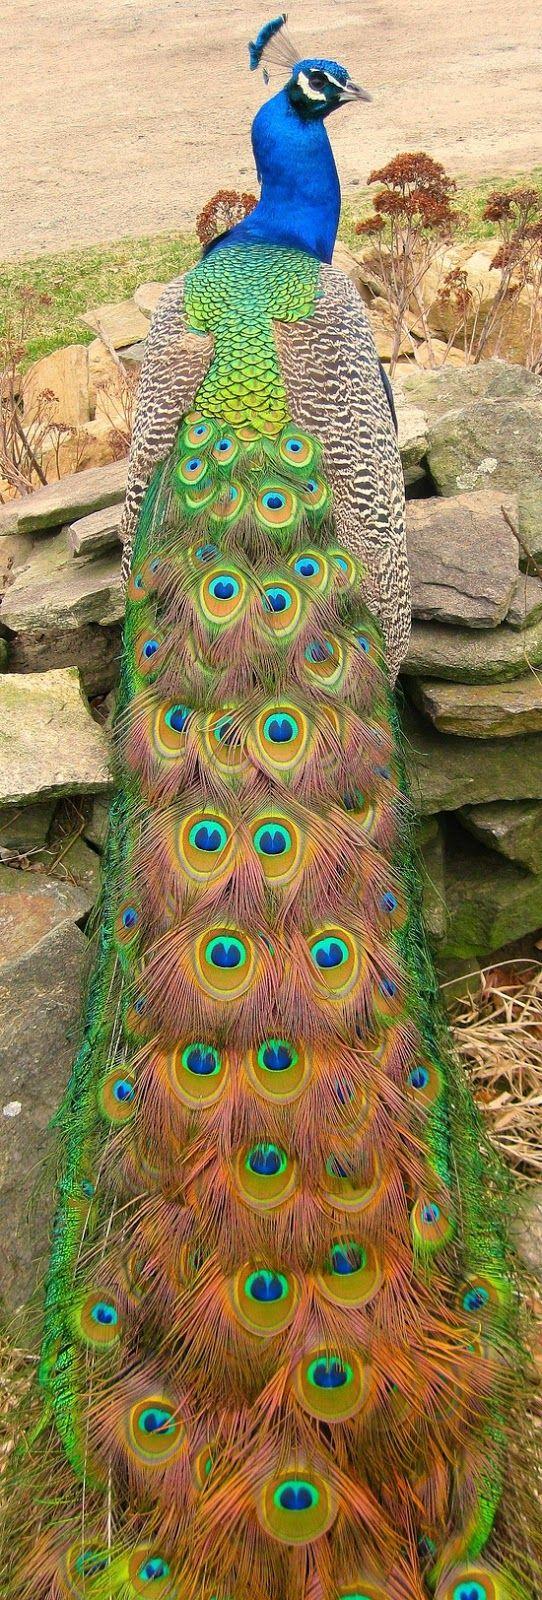 Peacocks are so mesmerizing and beautiful.